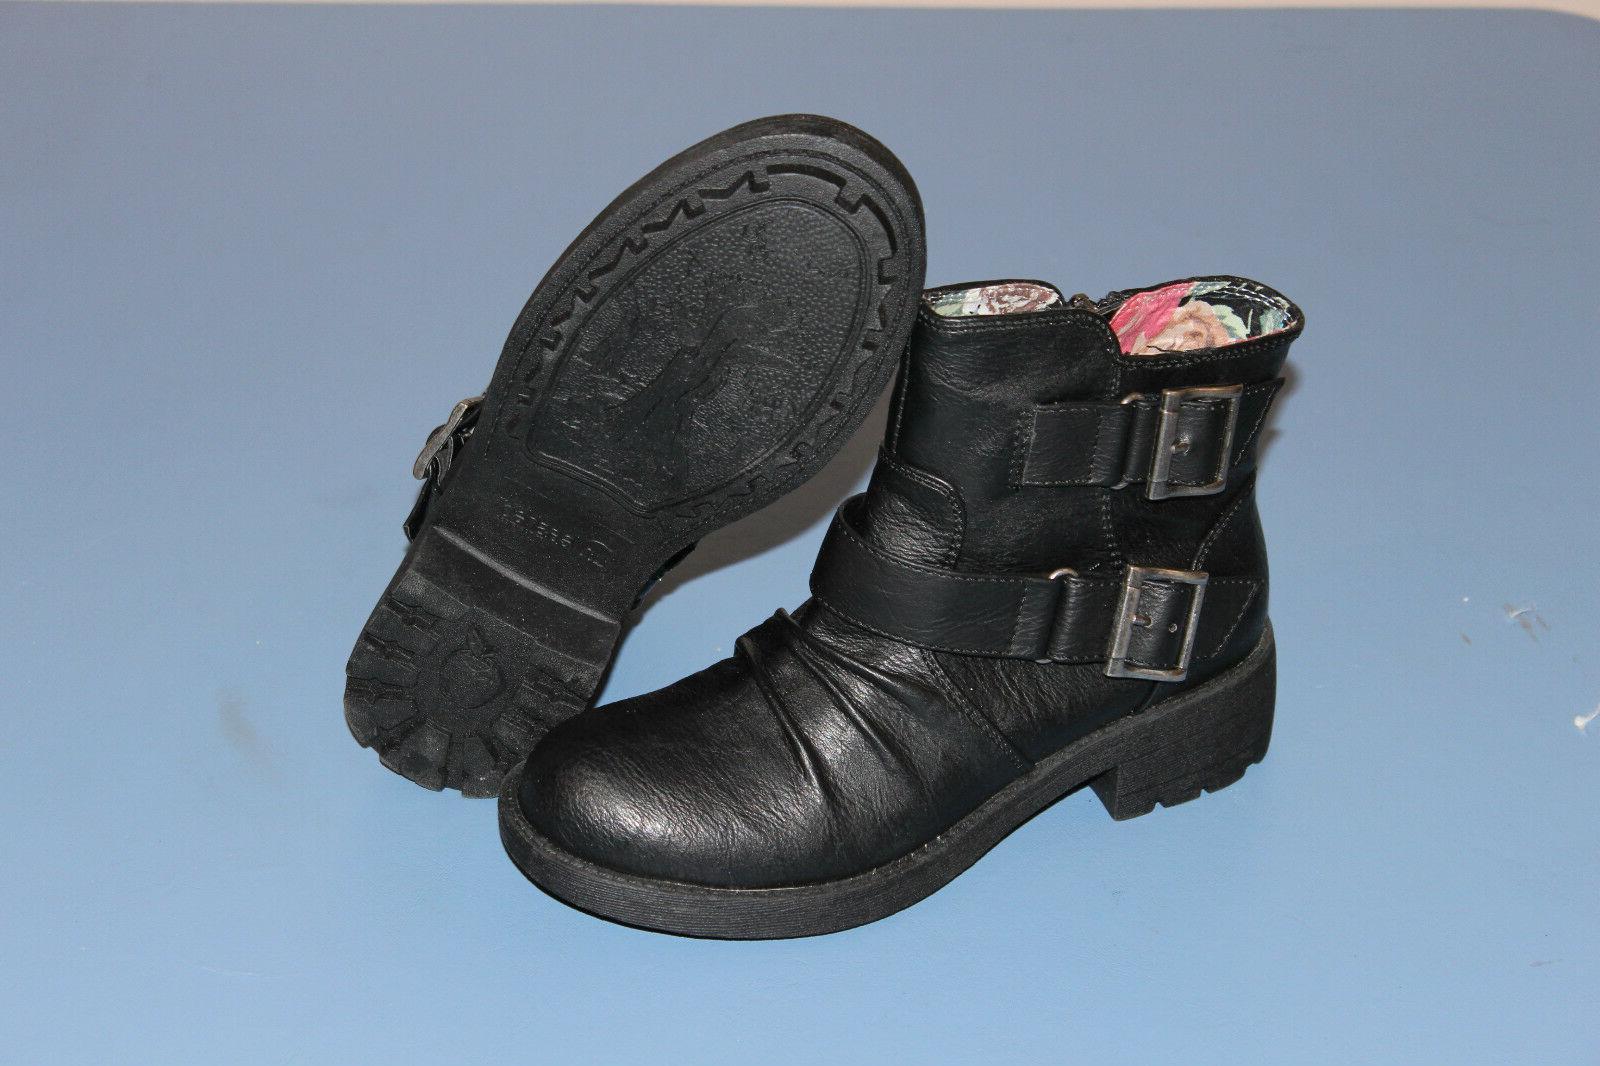 rocketdog womens motorcycle style boots tracks unleashed